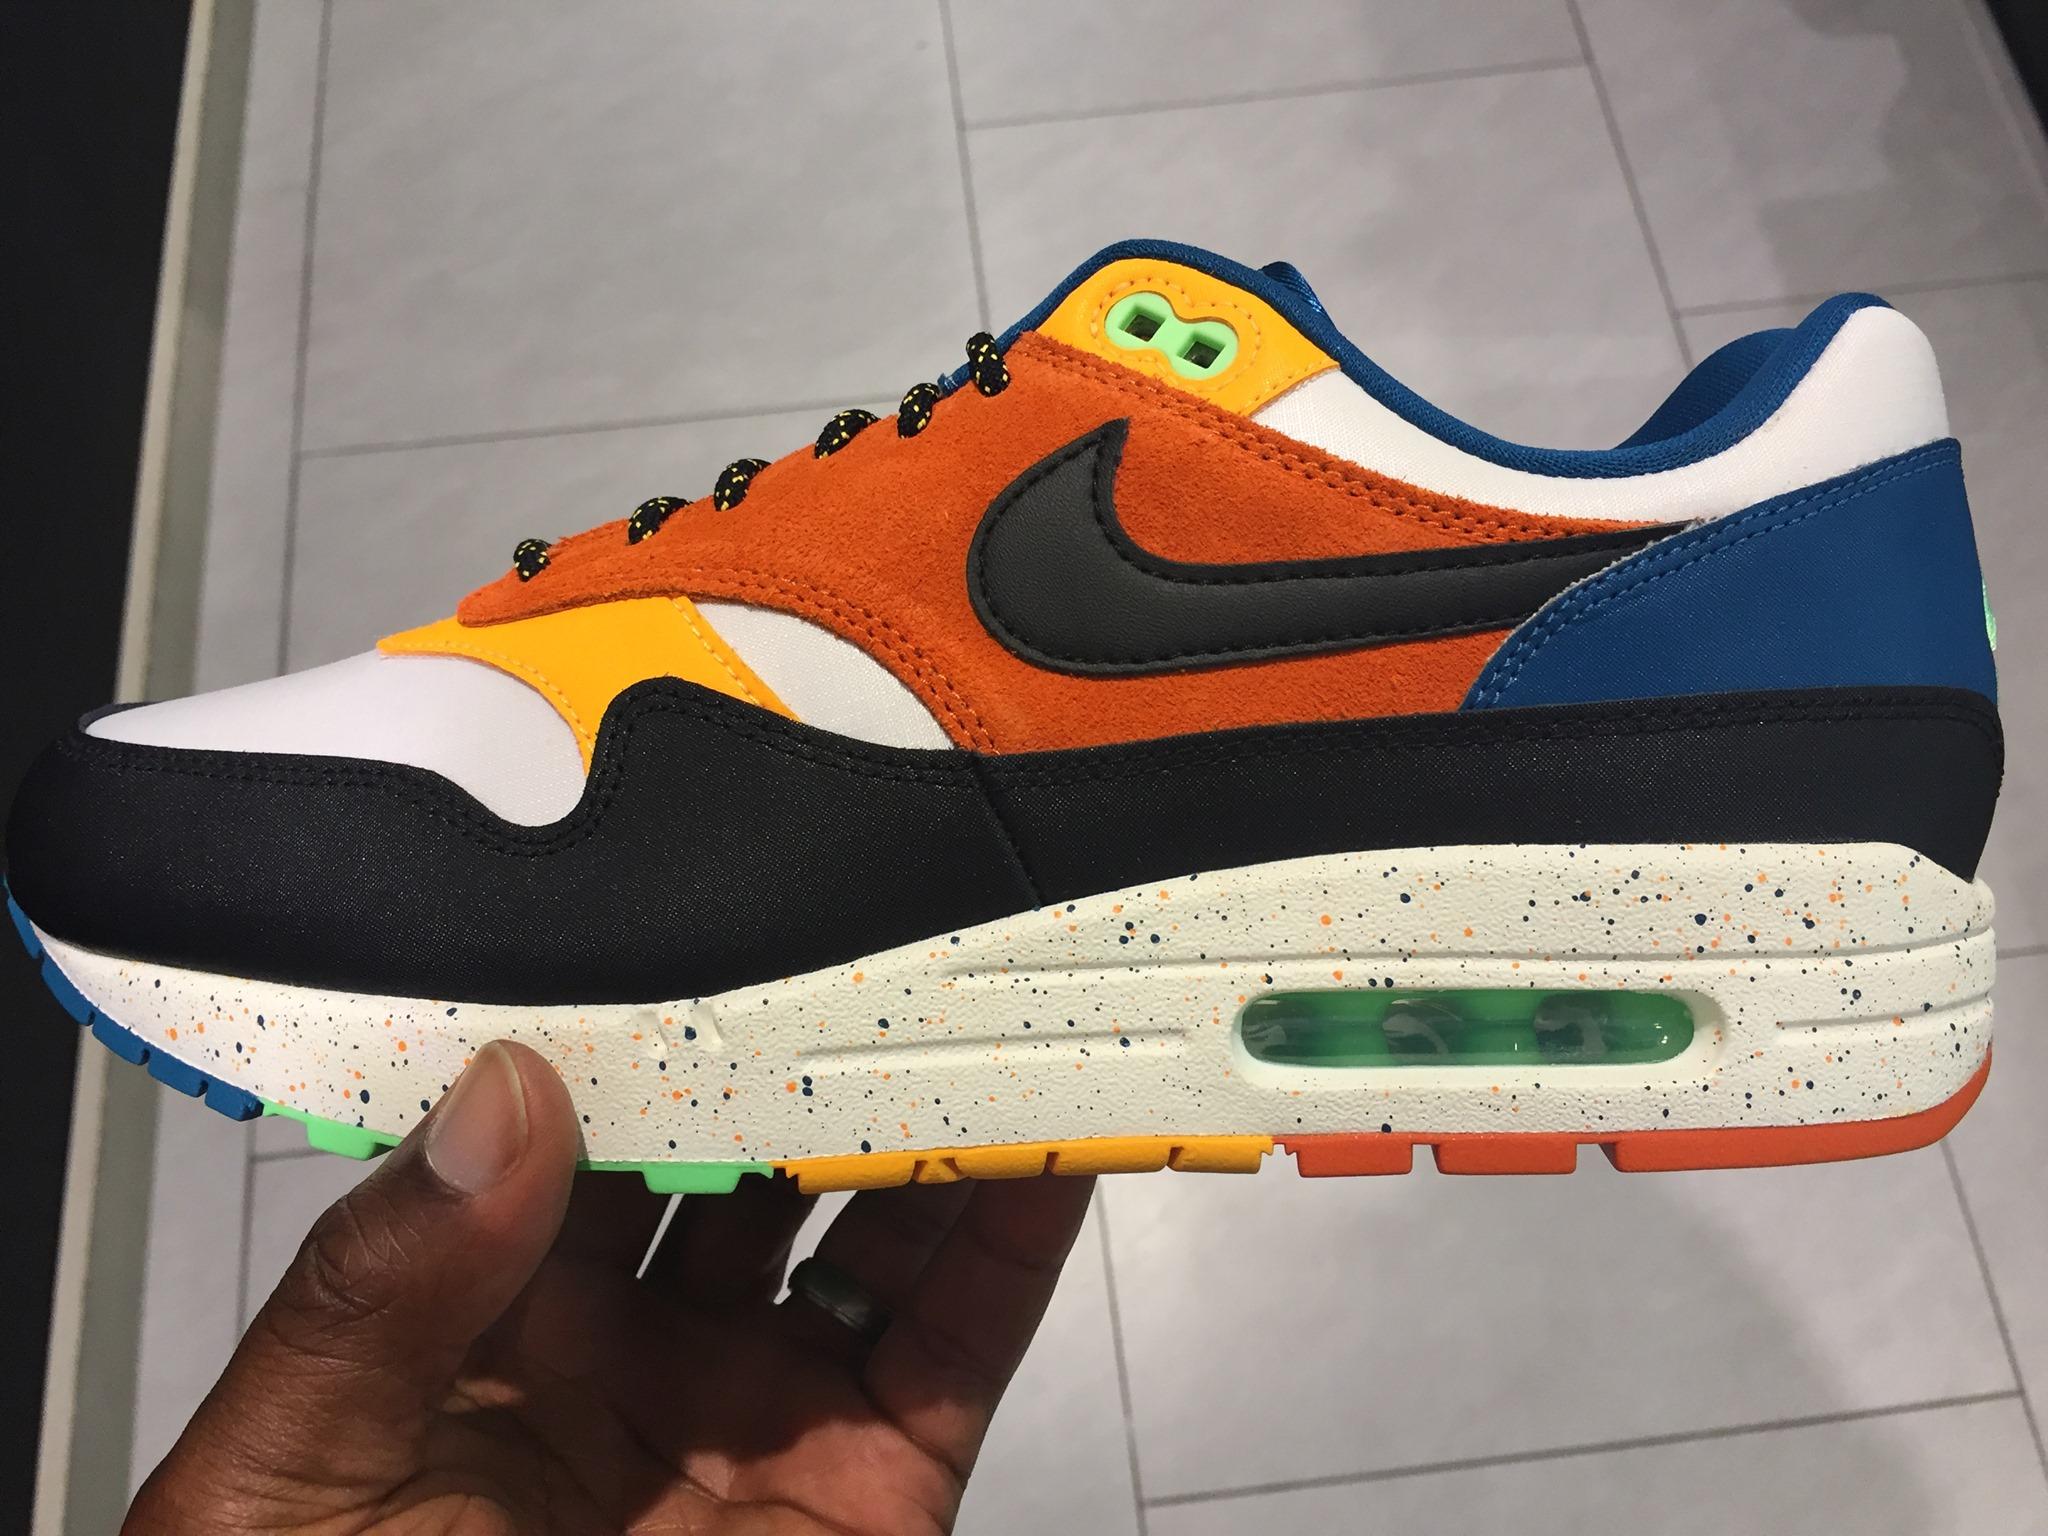 Aparecer controlador coser  Where To Buy The Nike Air Max 1 Multicolor Mix CZ8140-001